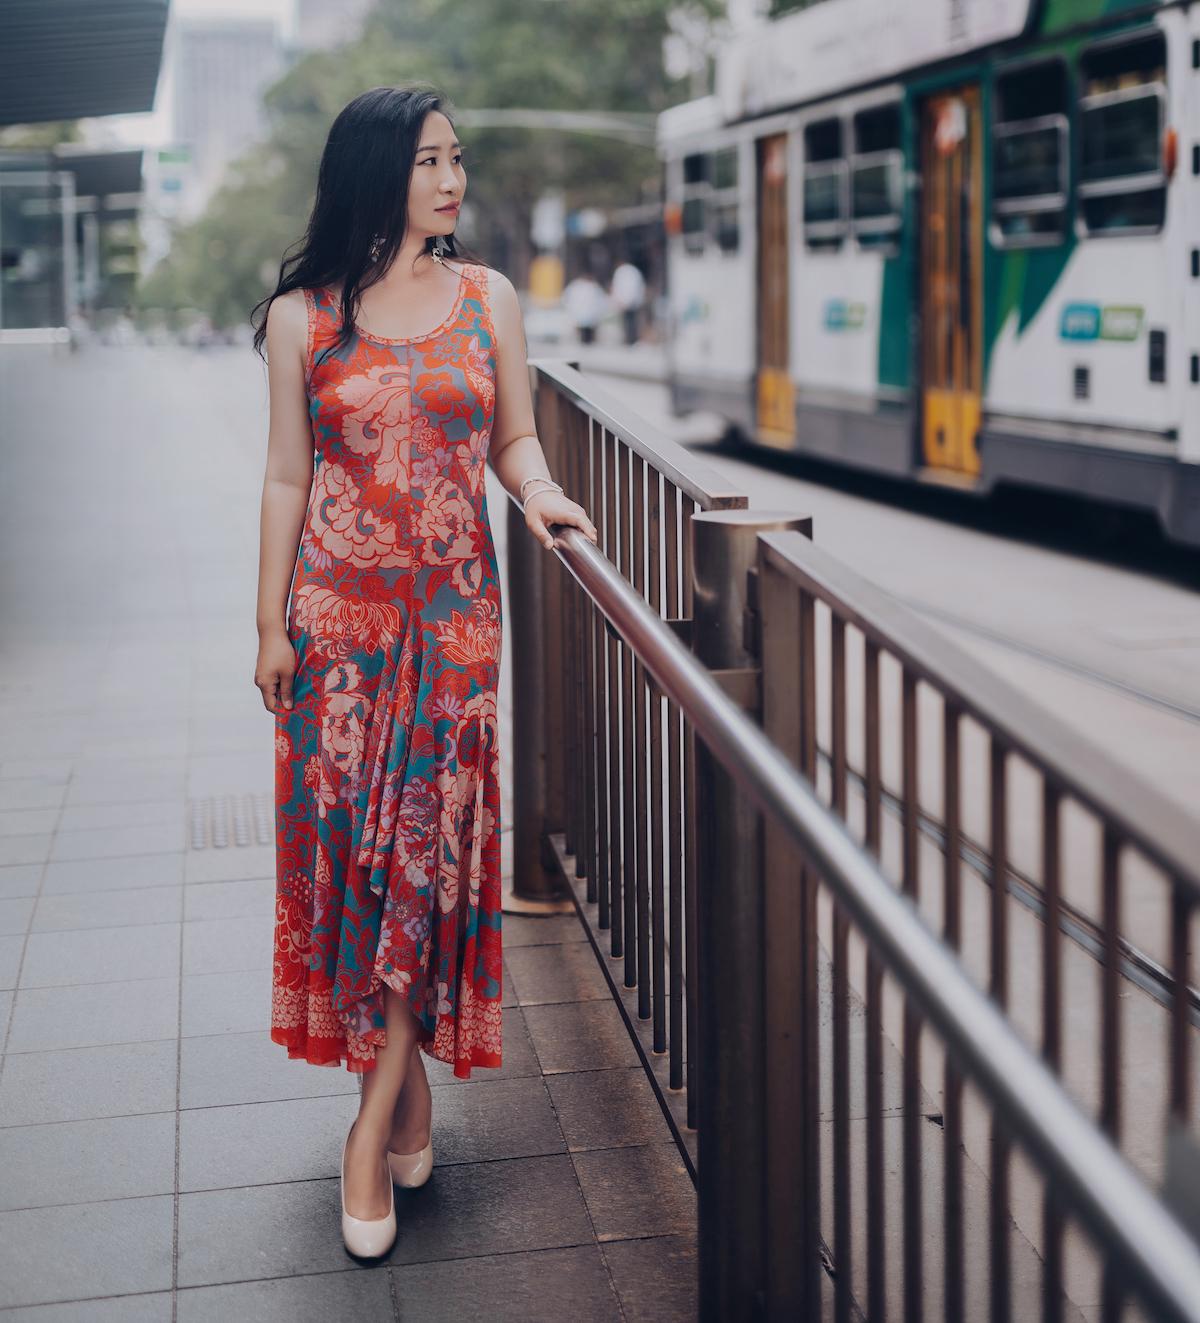 Lili-Liu-singer-profile